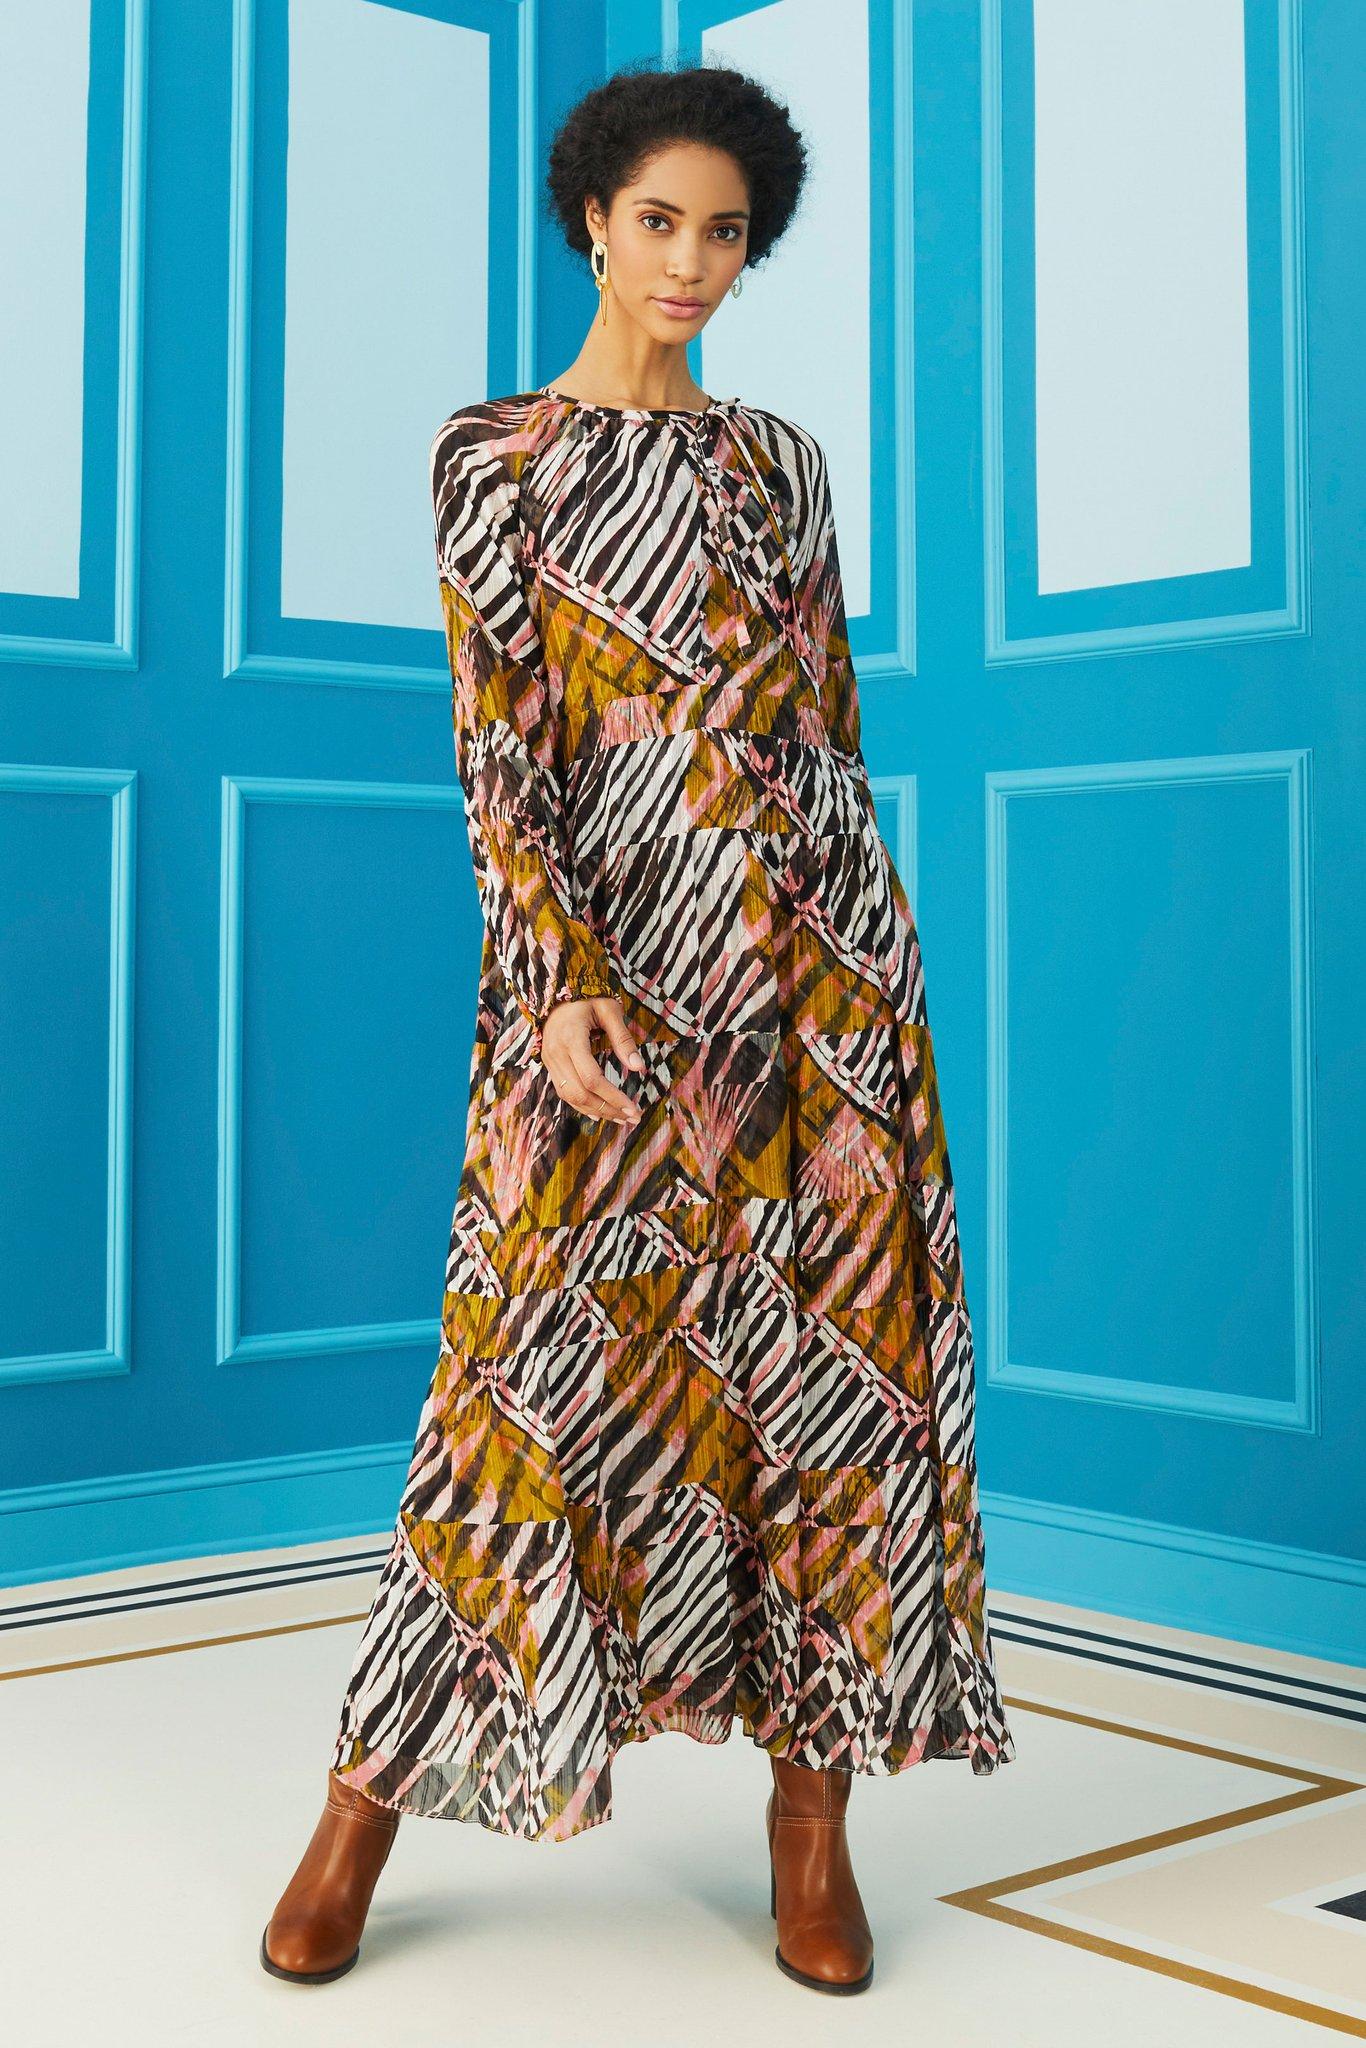 Marie-Oliver-Venice-Caftan-Zebra-Wood-03_1366x